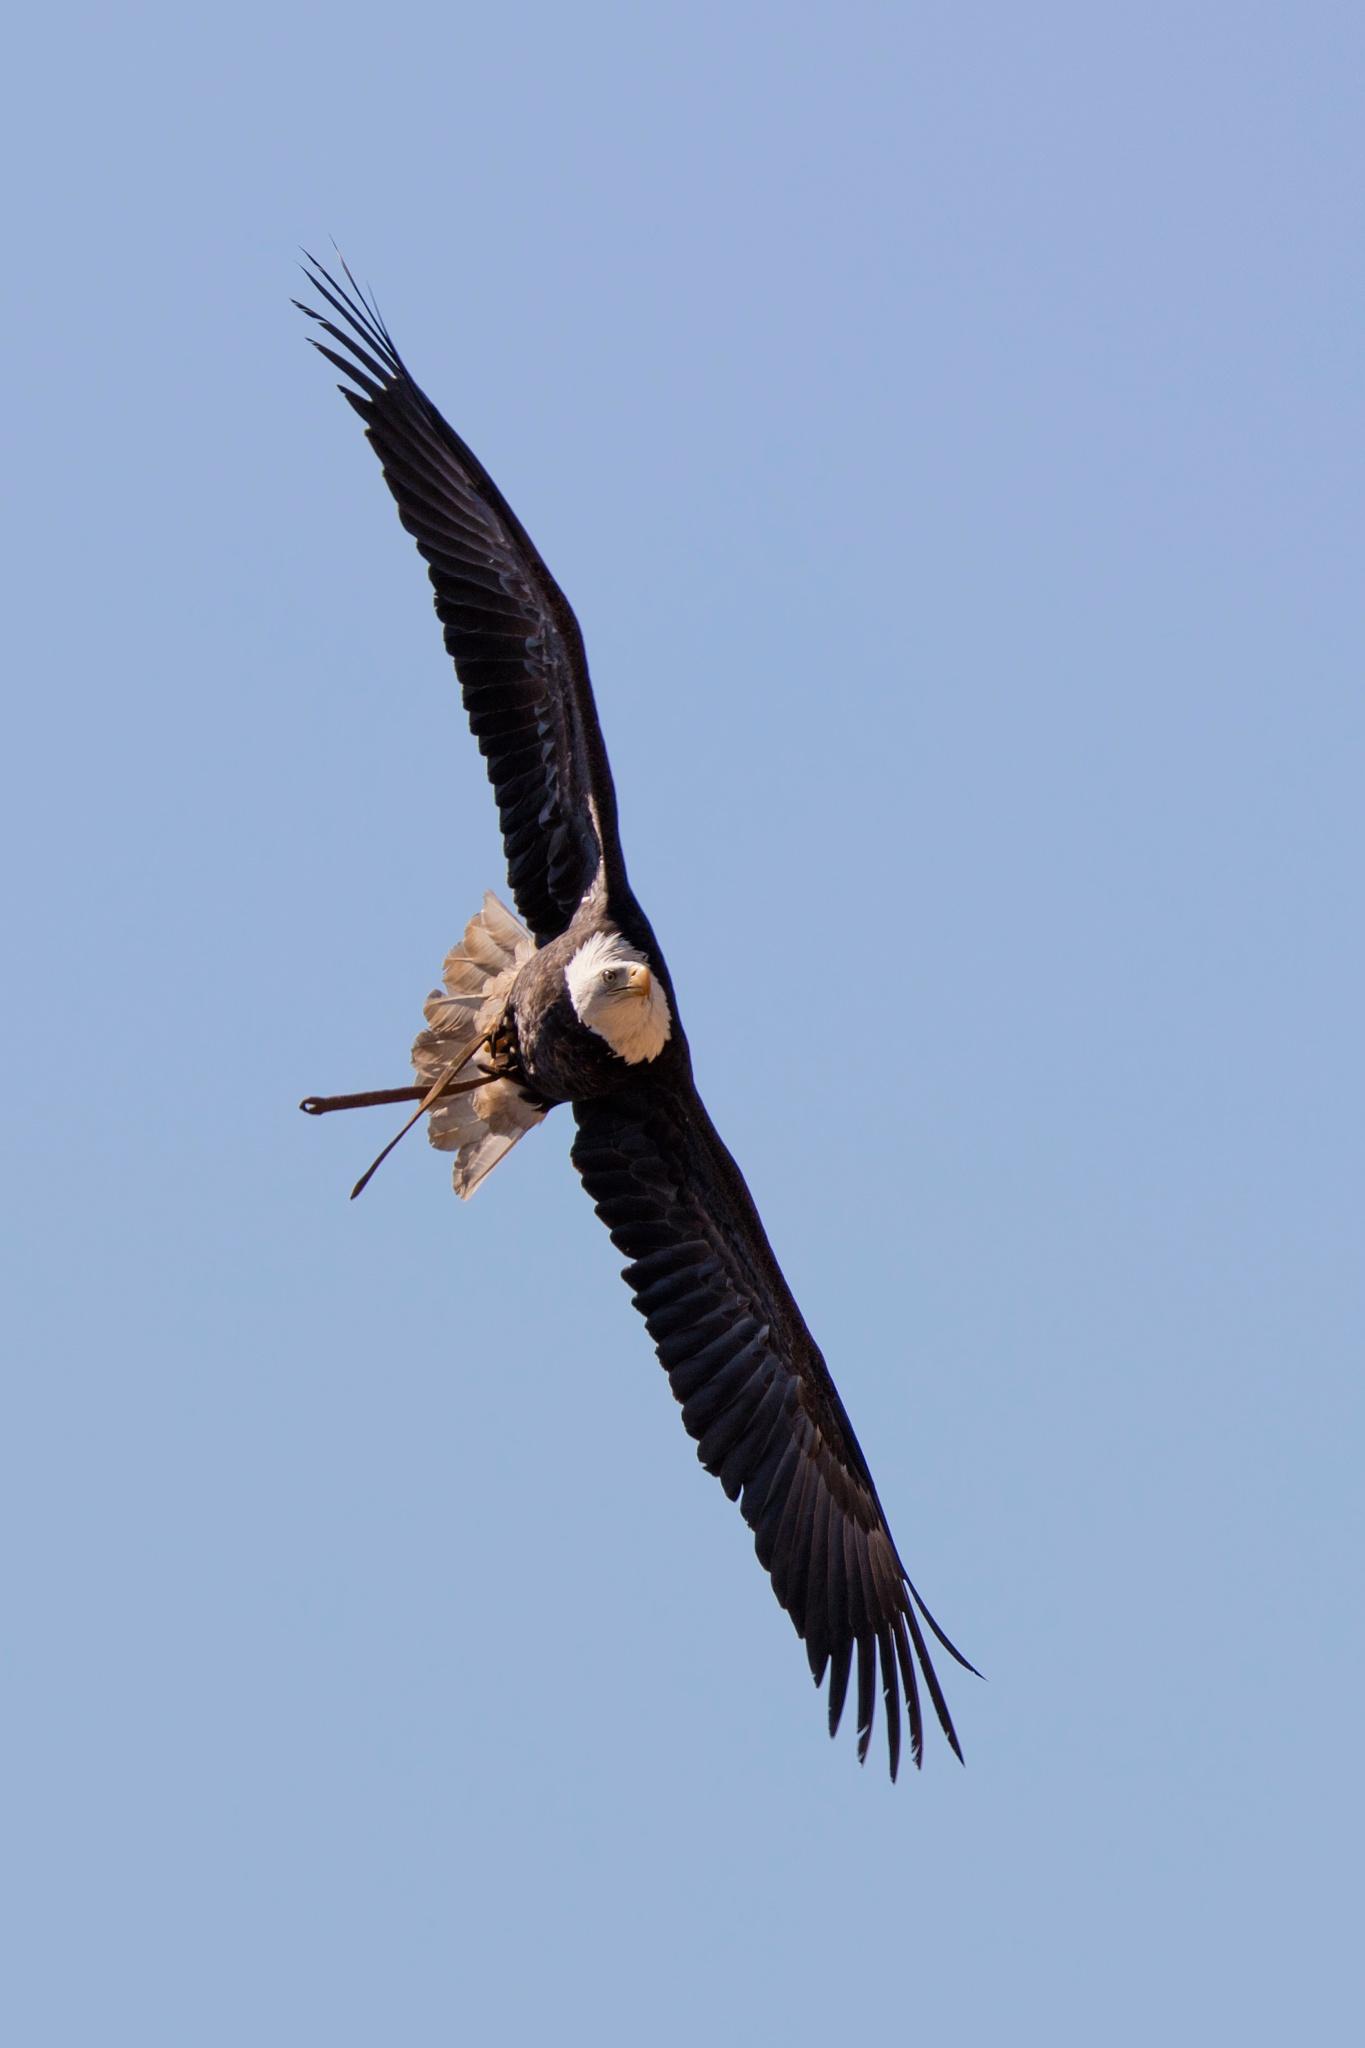 Birds of Prey Zoo Amneville - Bald Eagle by BerndStephan